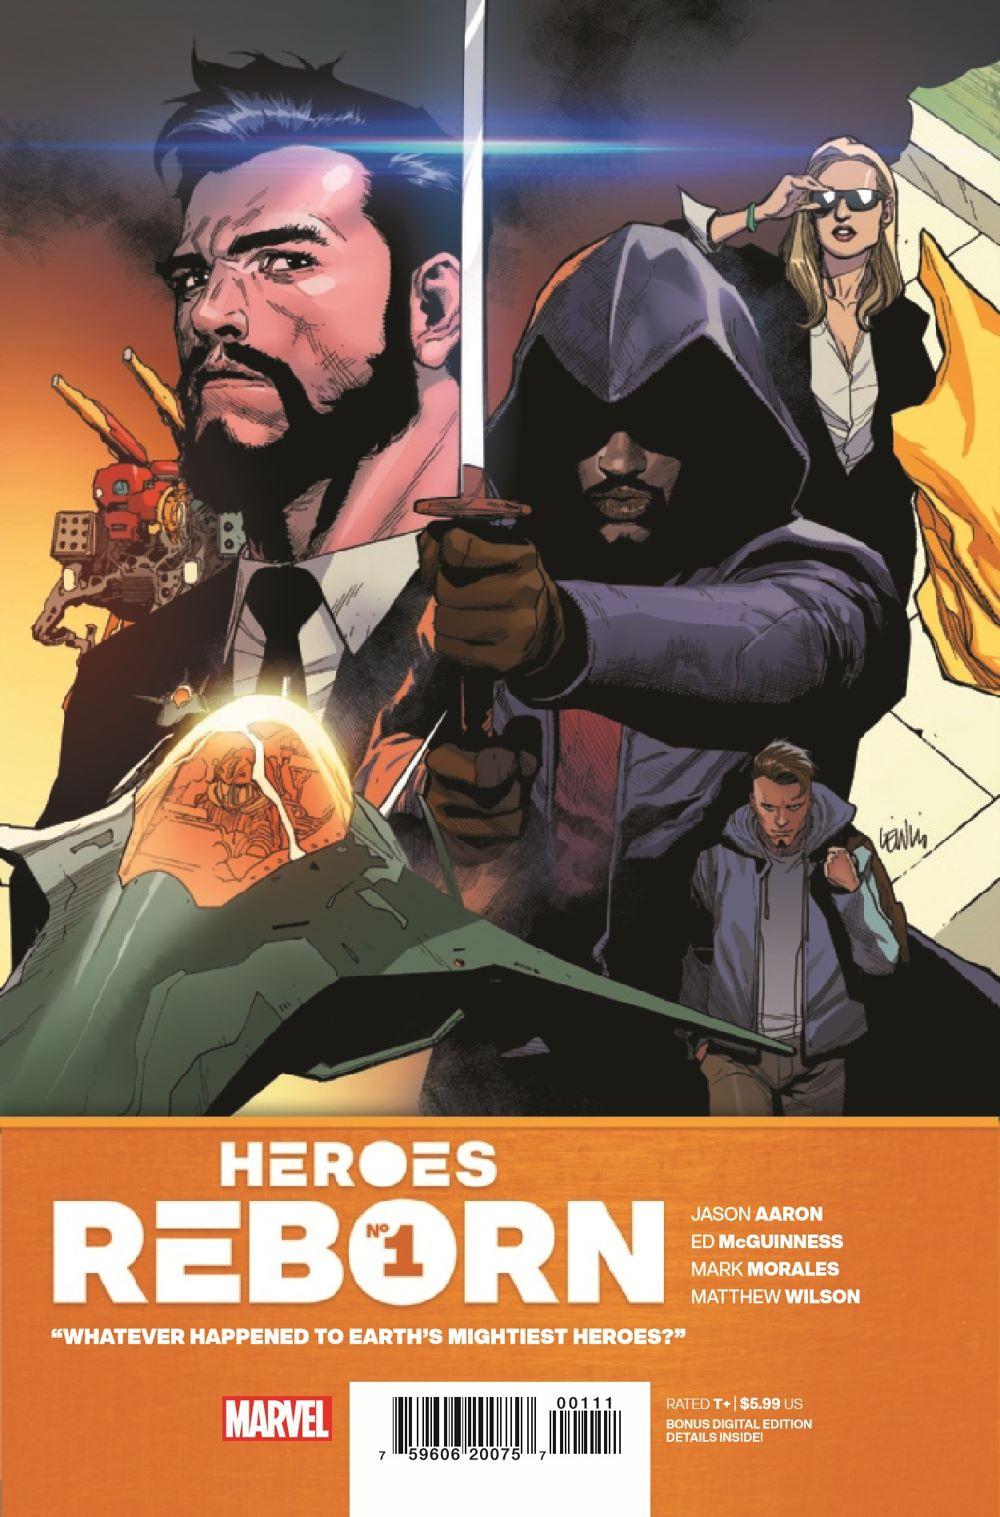 HEROESREBORN2021001_Preview-1 ComicList Previews: HEROES REBORN #1 (OF 7)